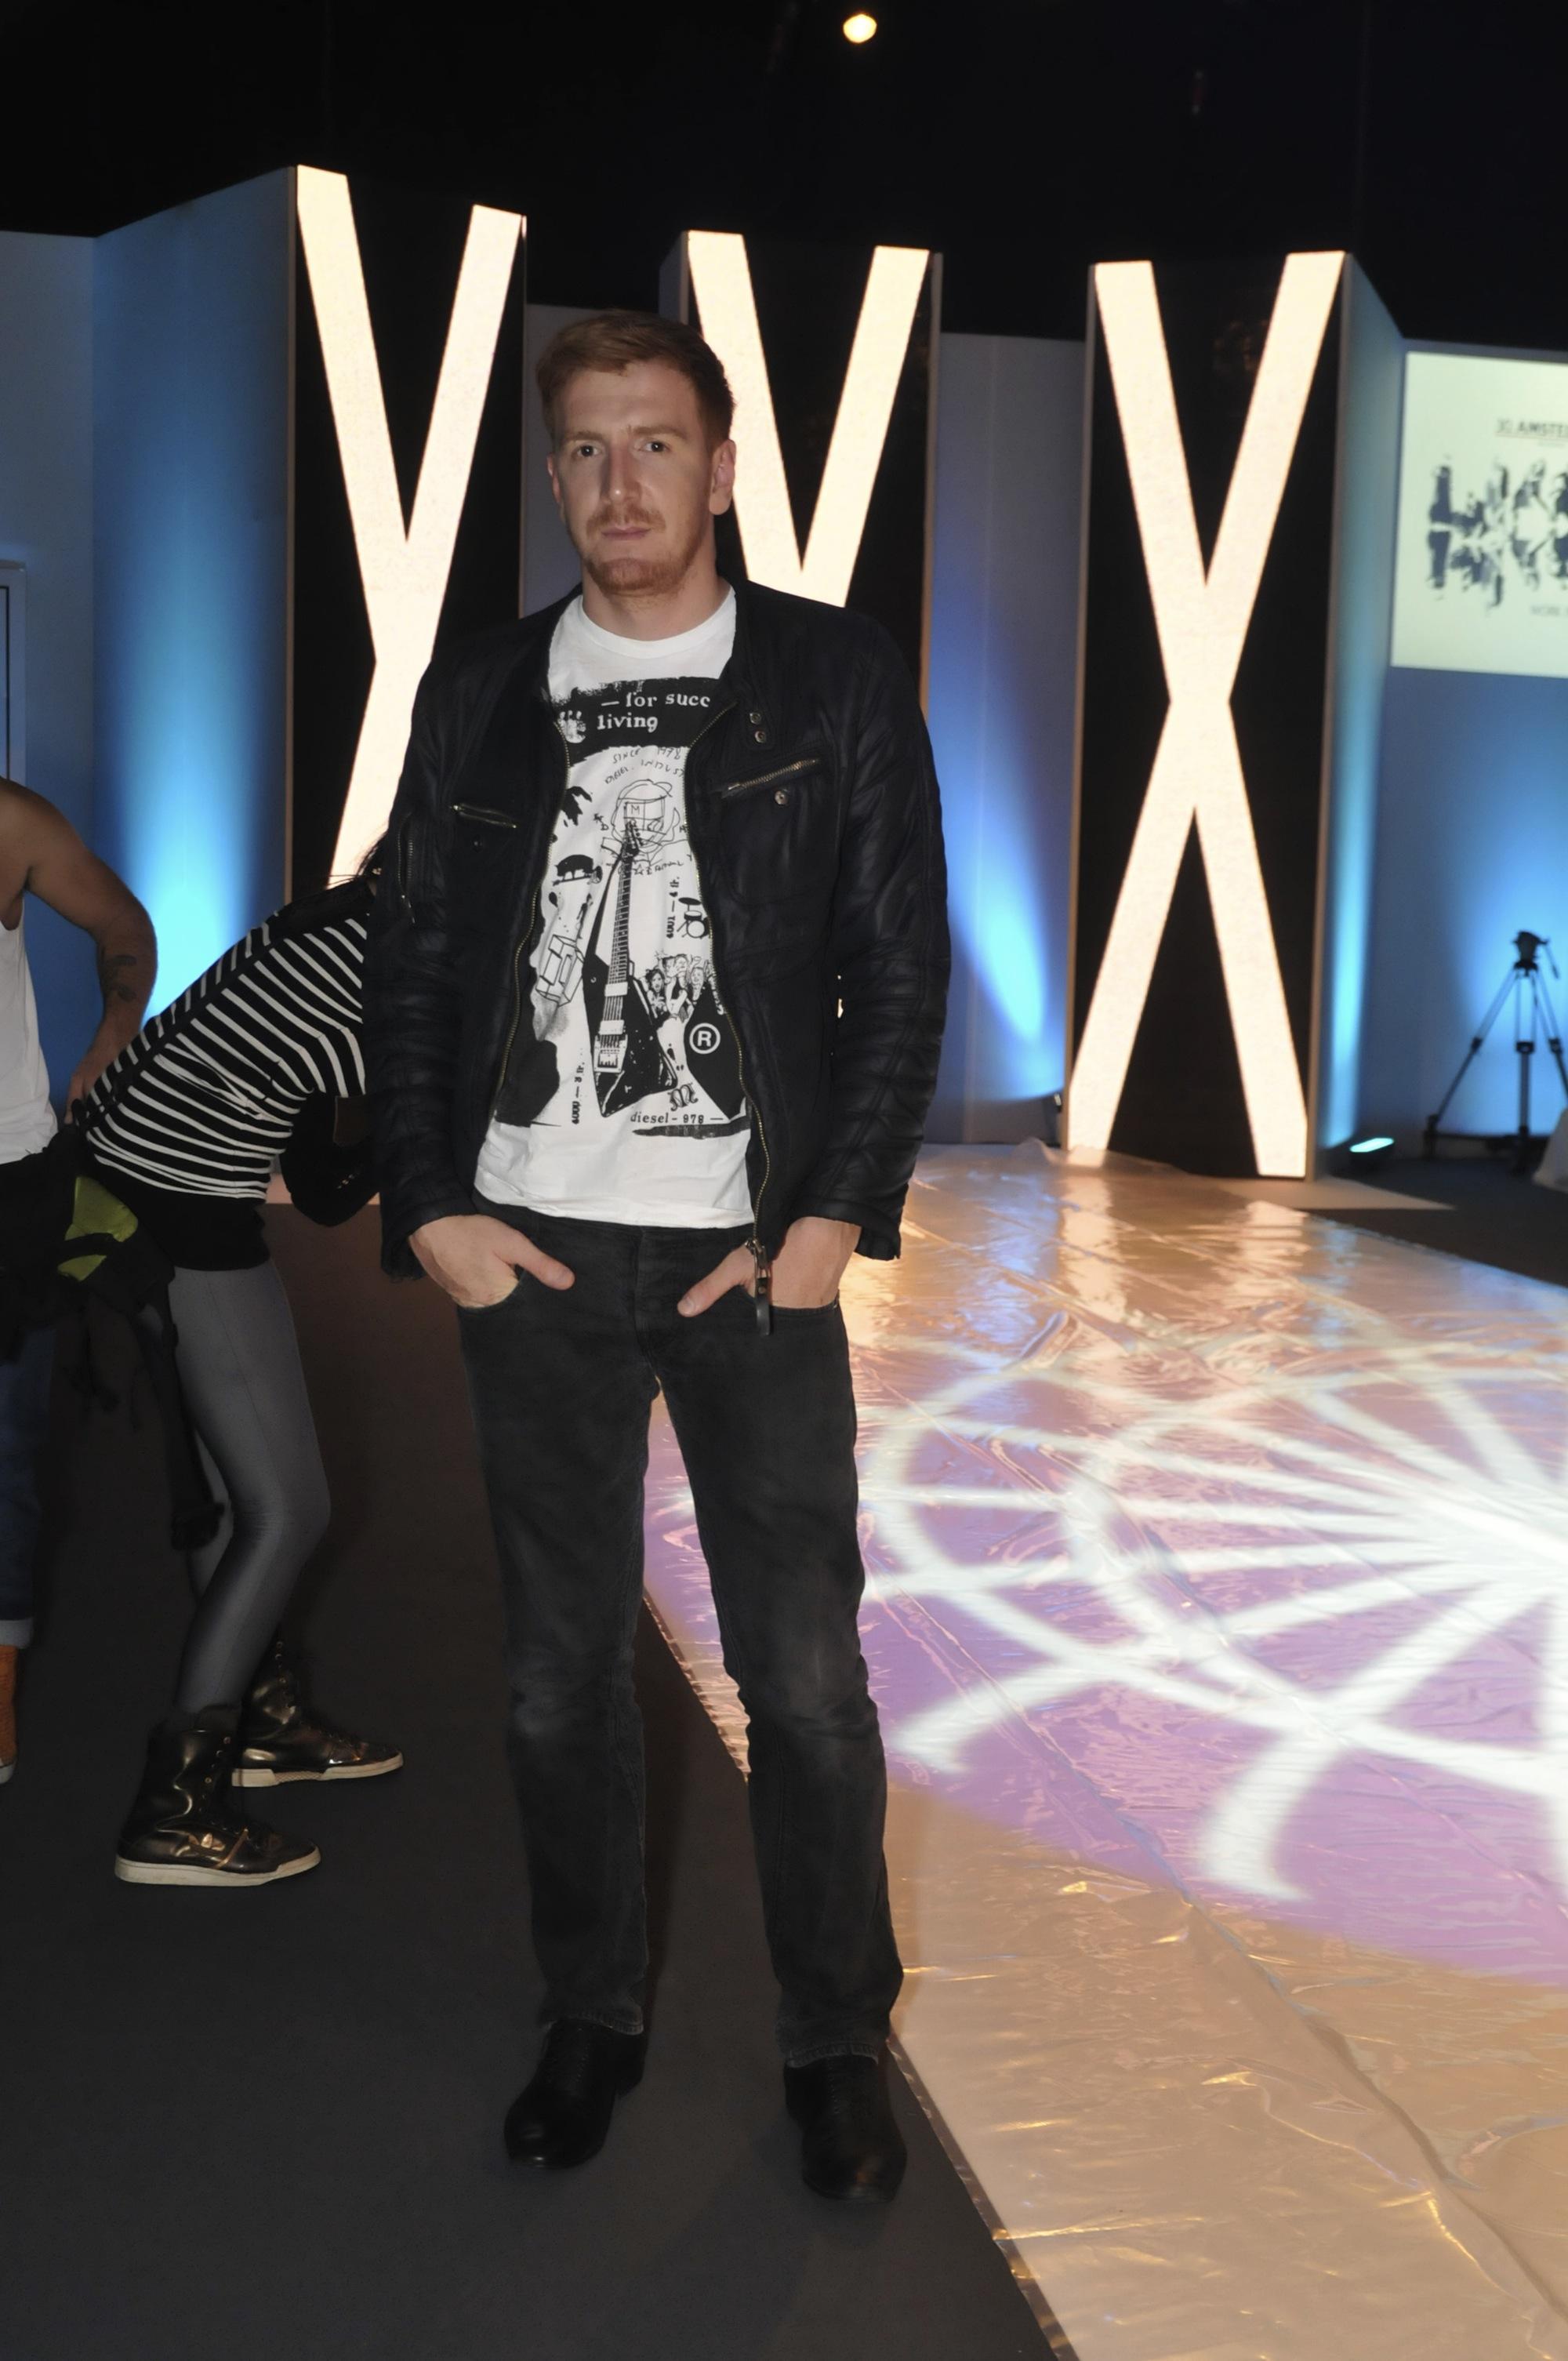 vladimir aleksic Peto veče 30.Amstel Fashion Week a